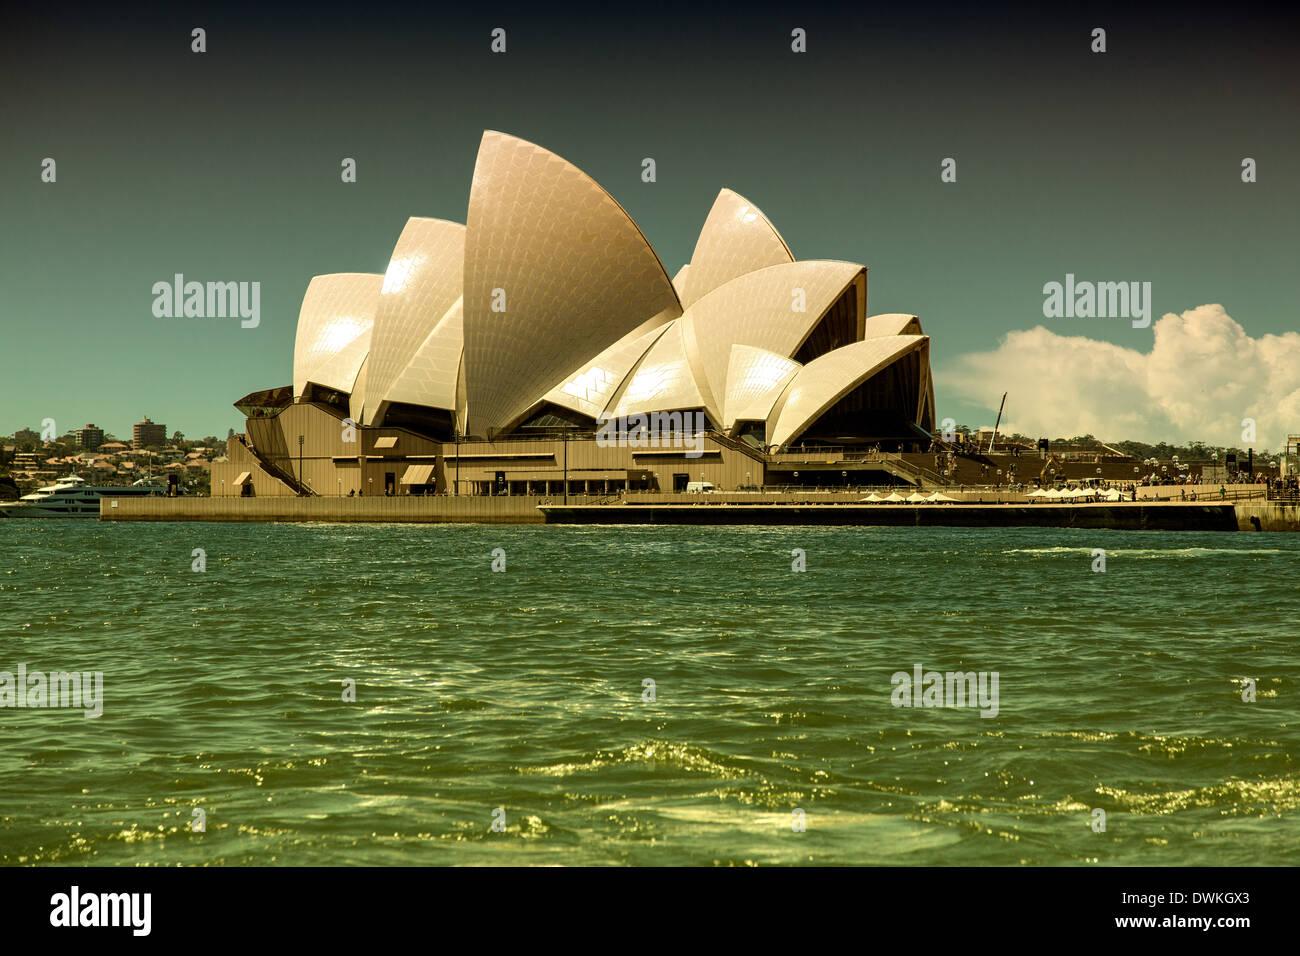 Opera House in Sydney - Stock Image